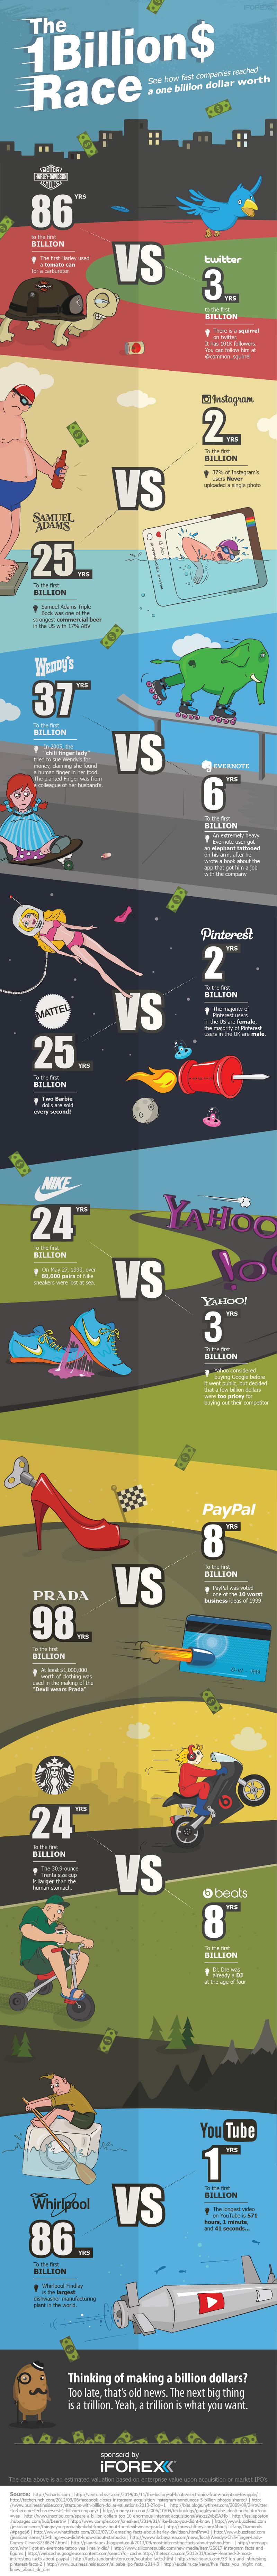 Billion-Dollar-Companies